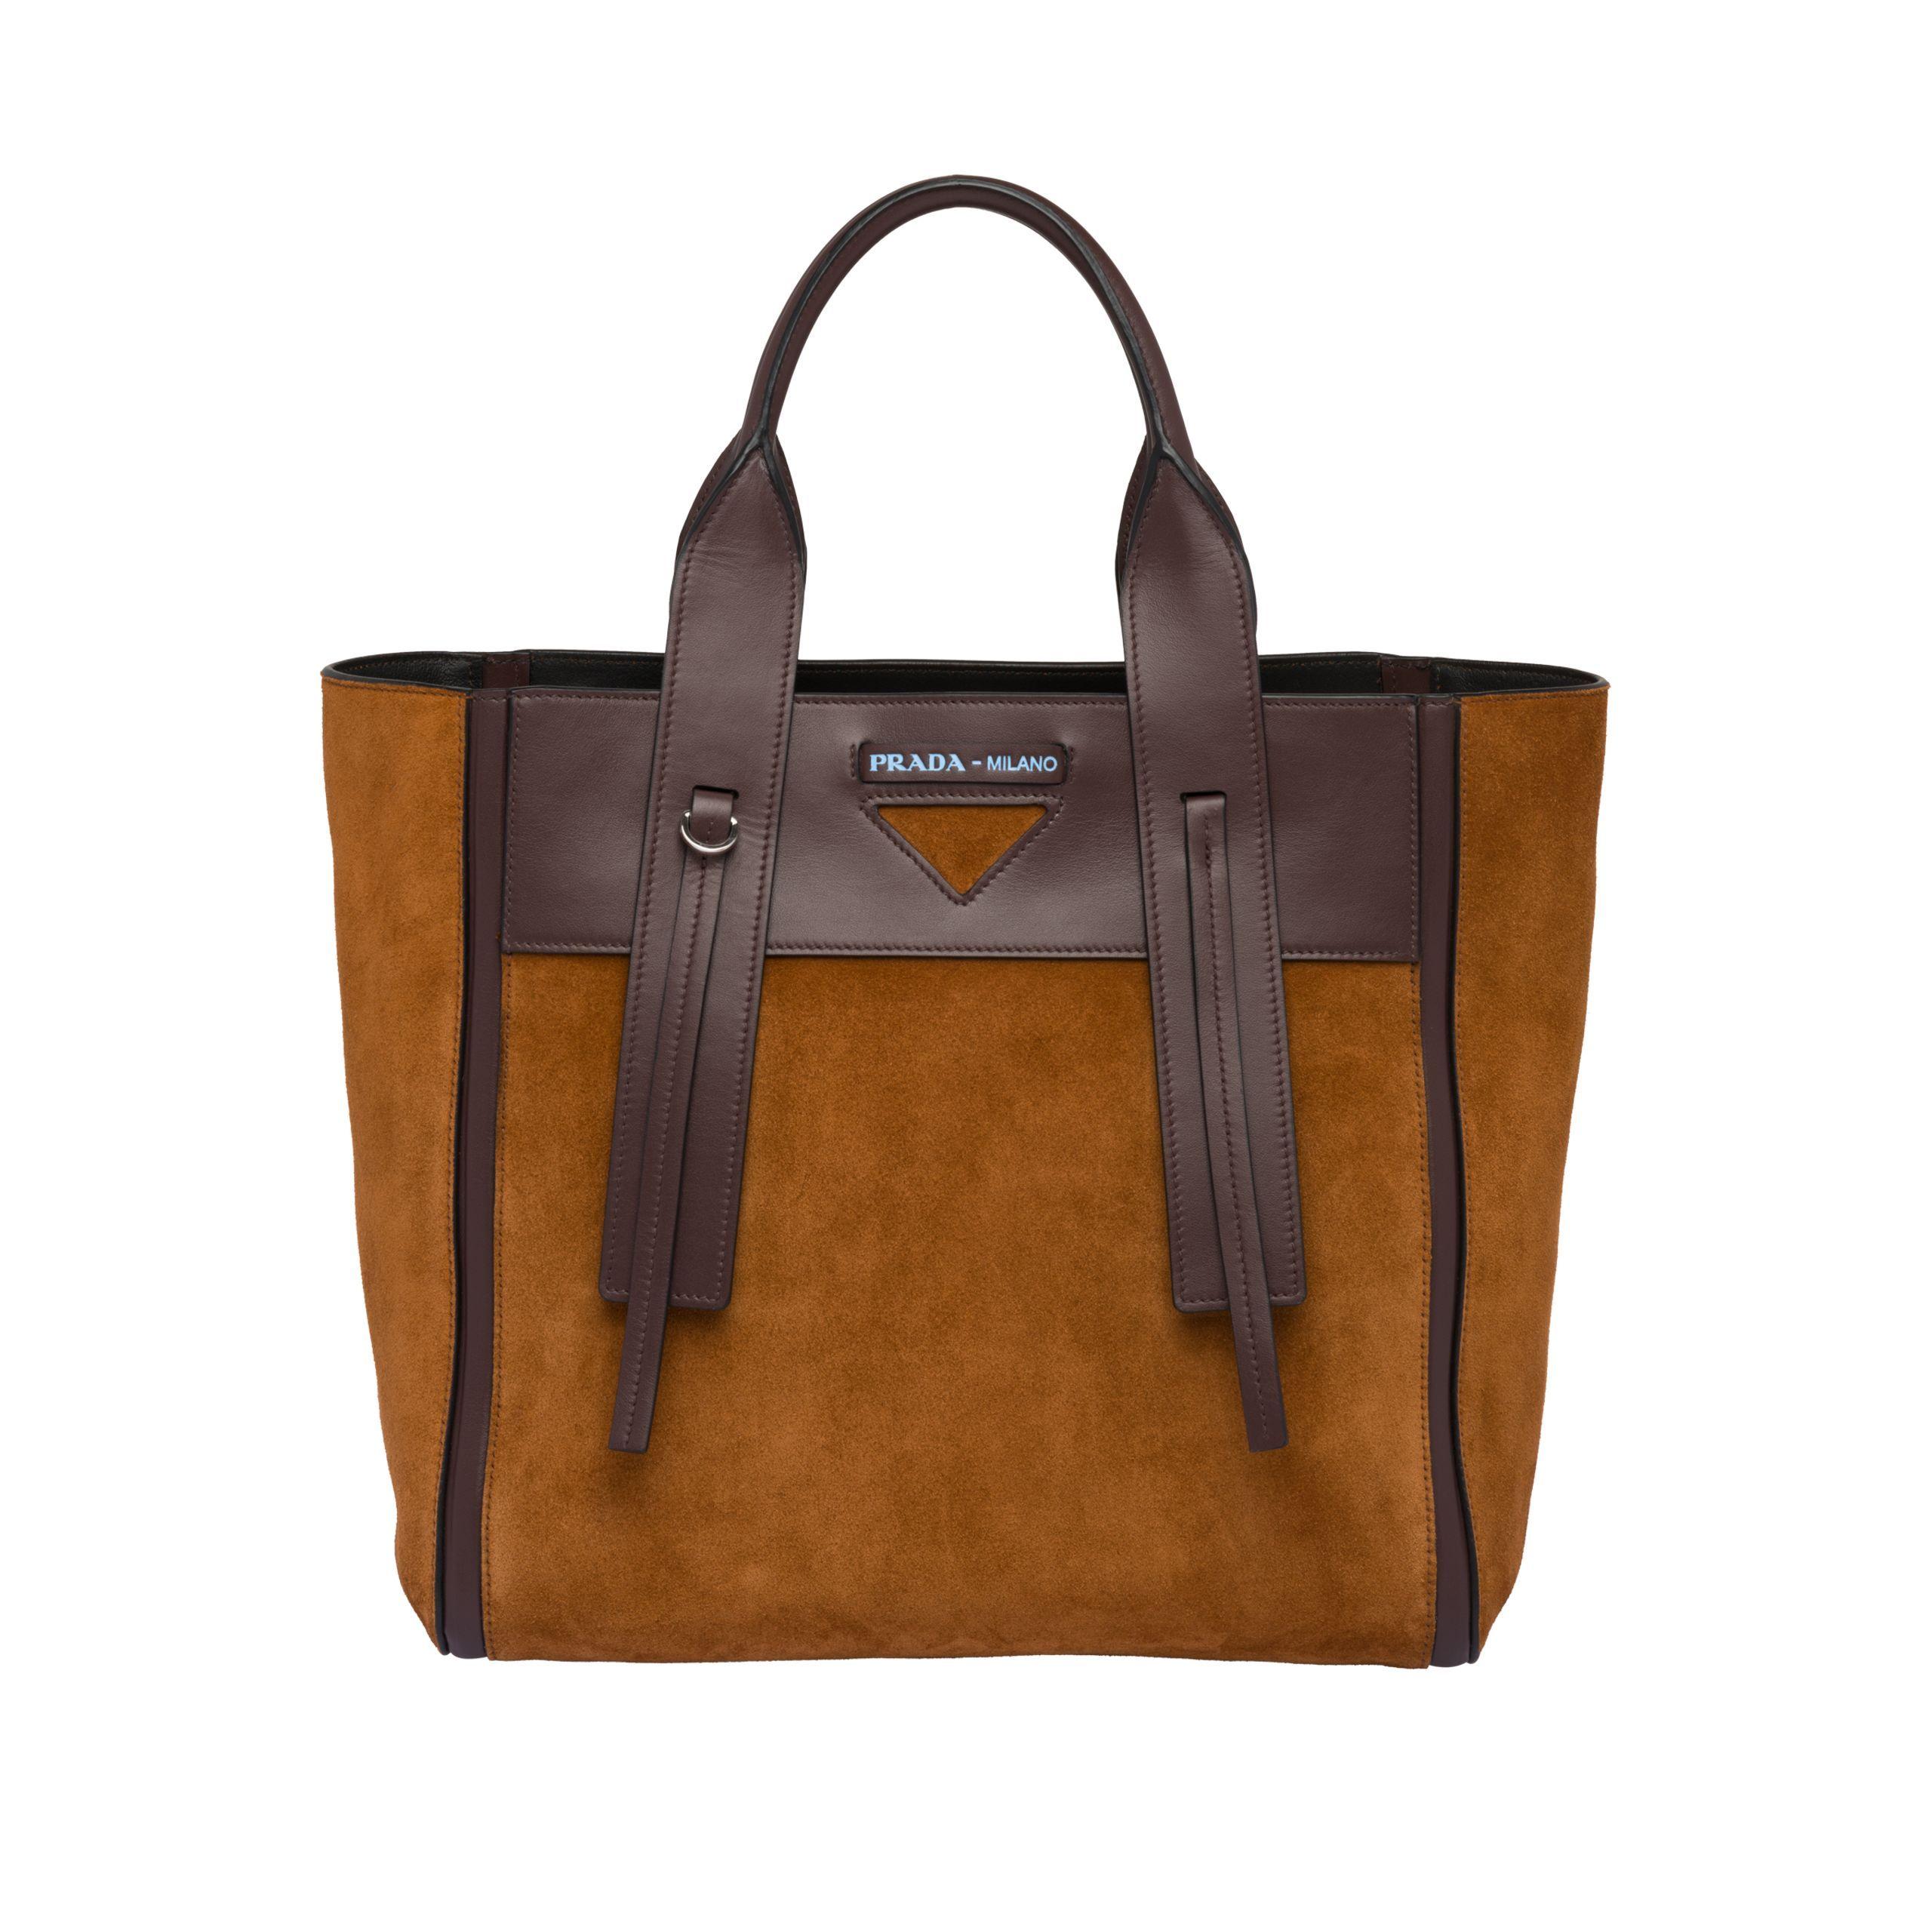 77f1e0b464cb5f Borsa Prada Ouverture maxi in pelle   BAGS in 2019   Pinterest   Bags and  Prada